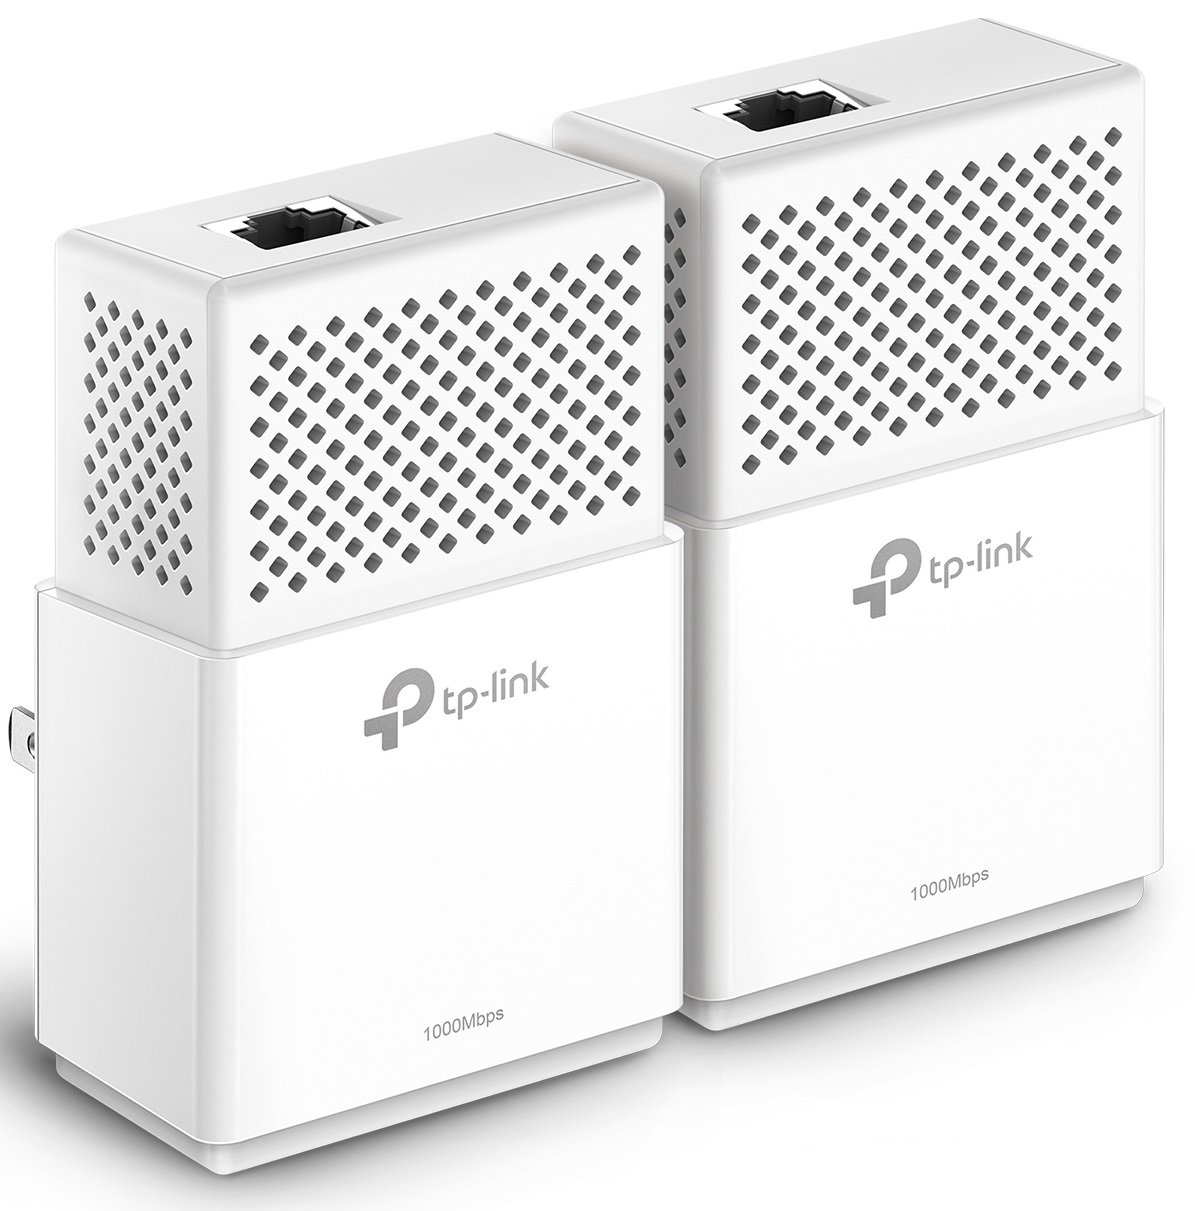 TP-Link AV1000 Gigabit Powerline ethernet Adapter kit, Powerline speeds up to 1000Mbps (TL-PA7010 KIT) by TP-Link (Image #3)